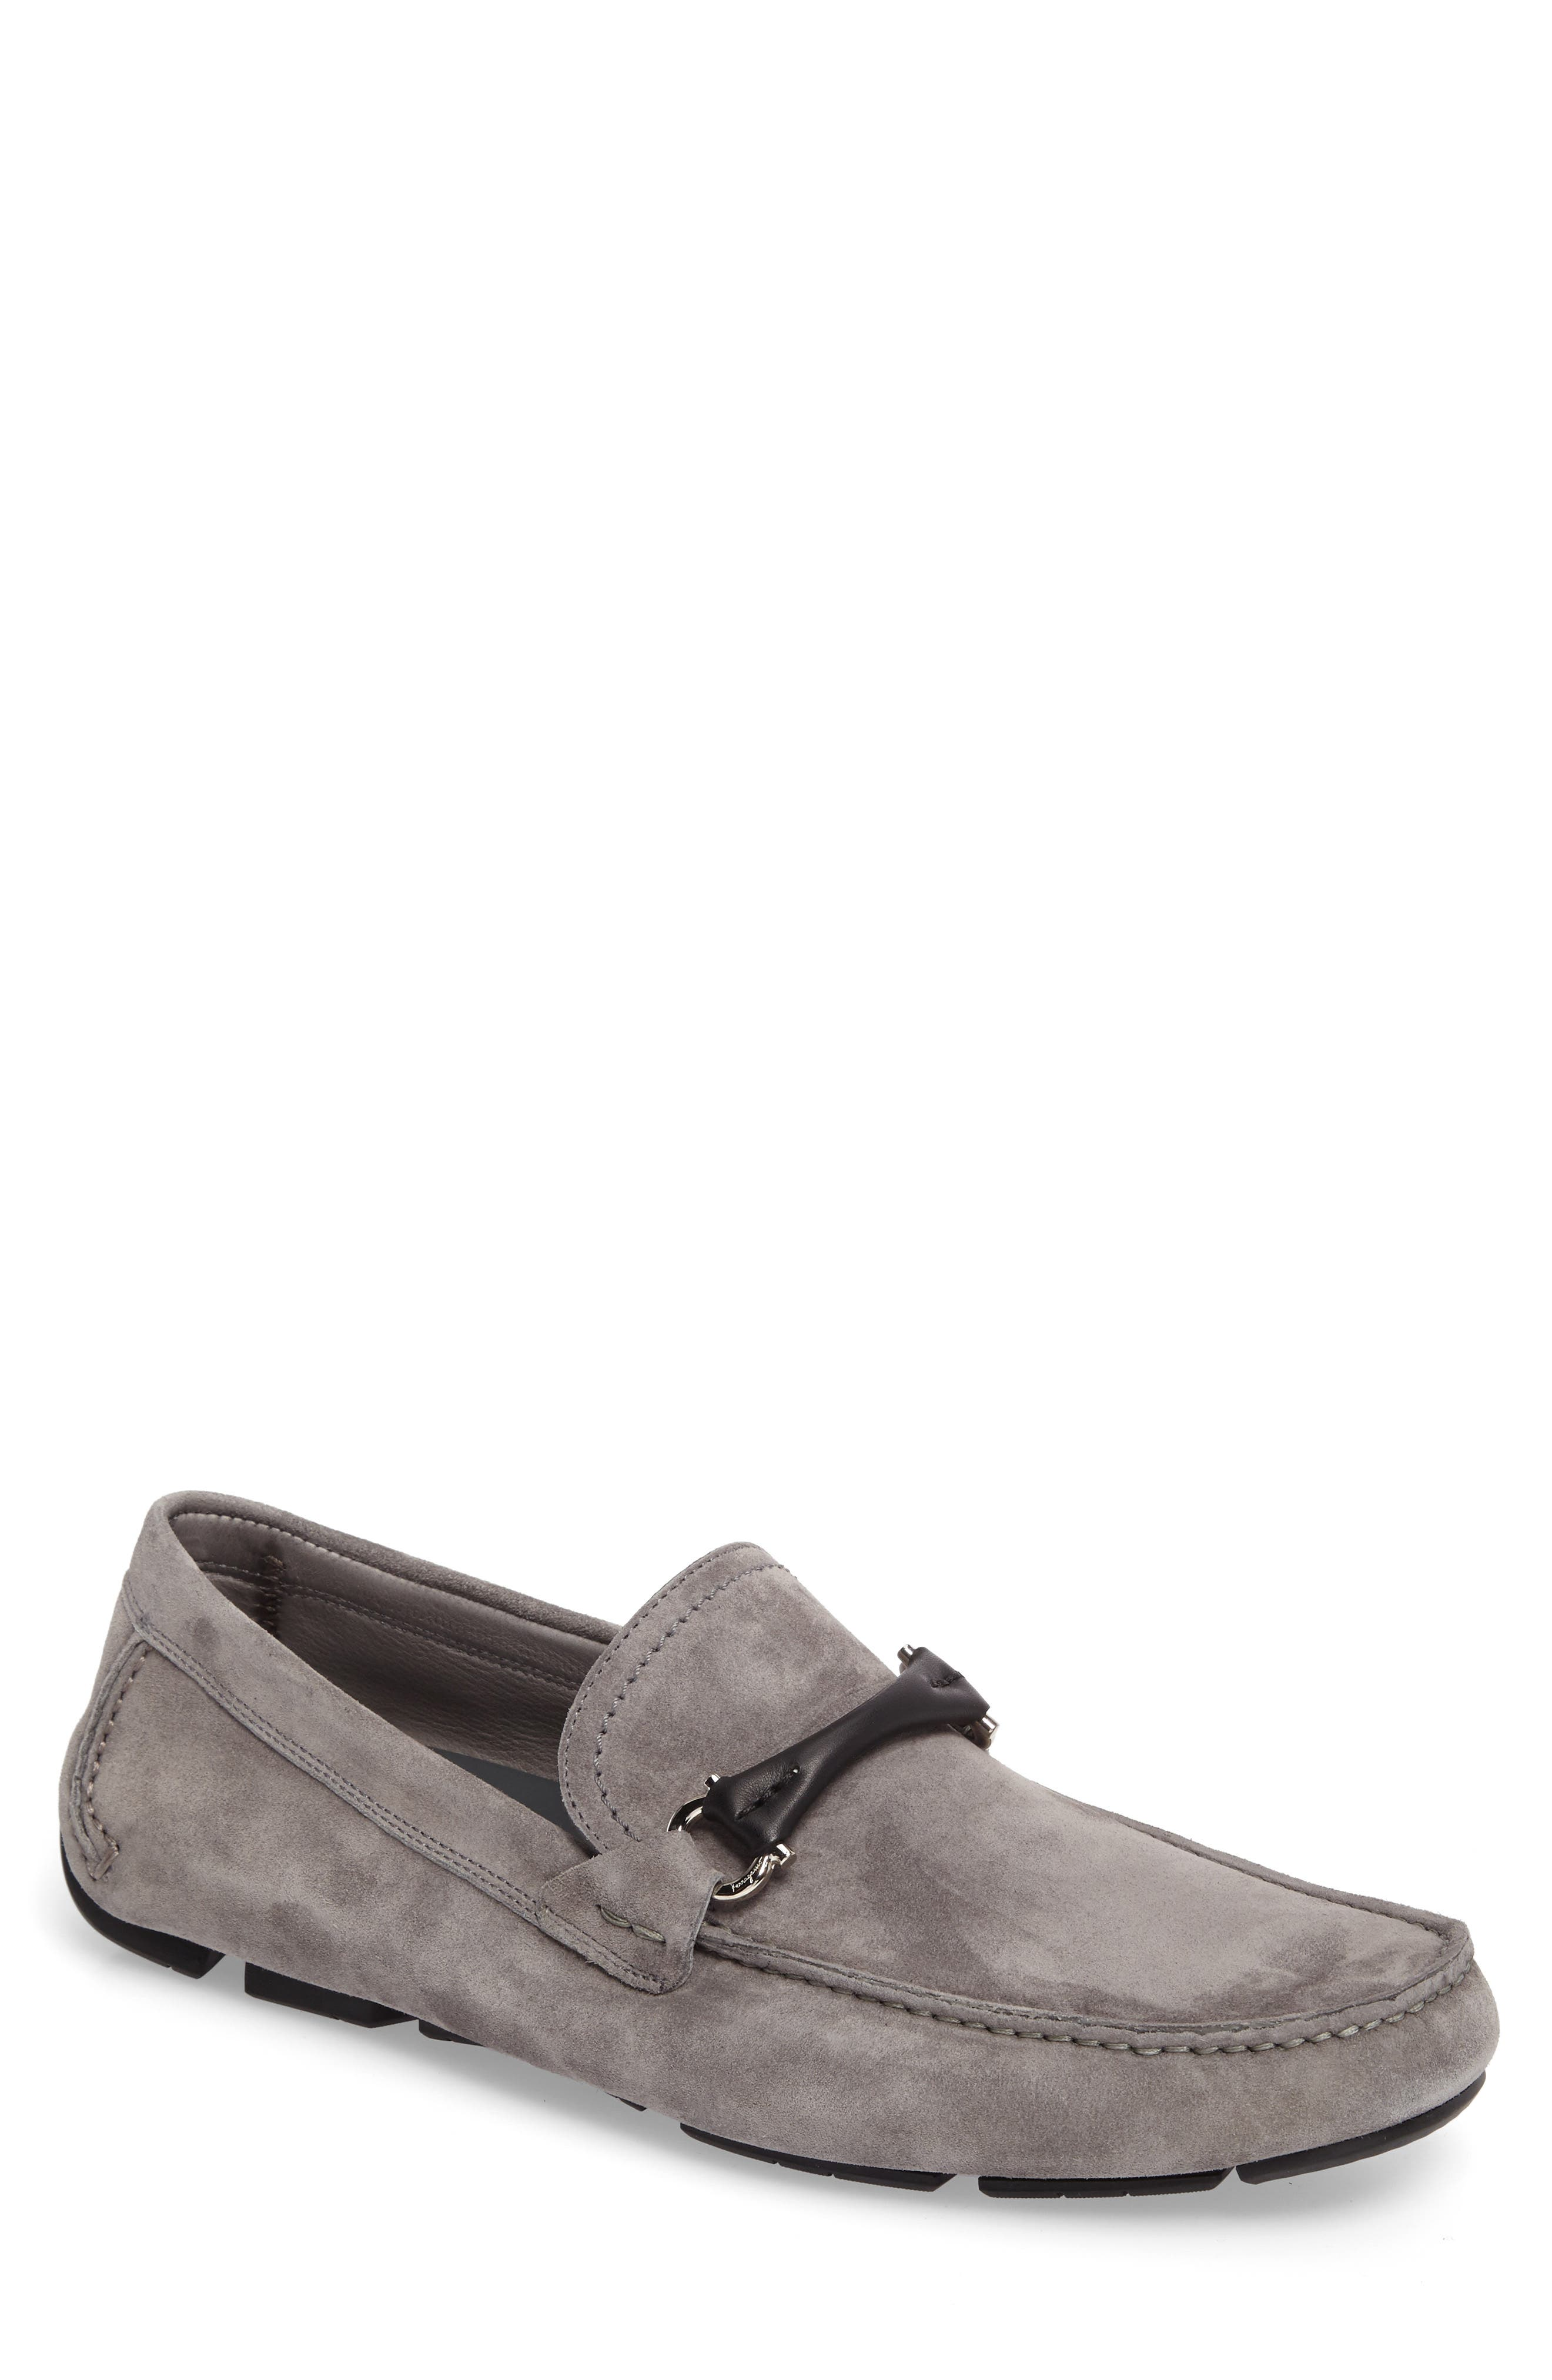 Salvatore Ferragamo GranprixDriving Shoe (Men)